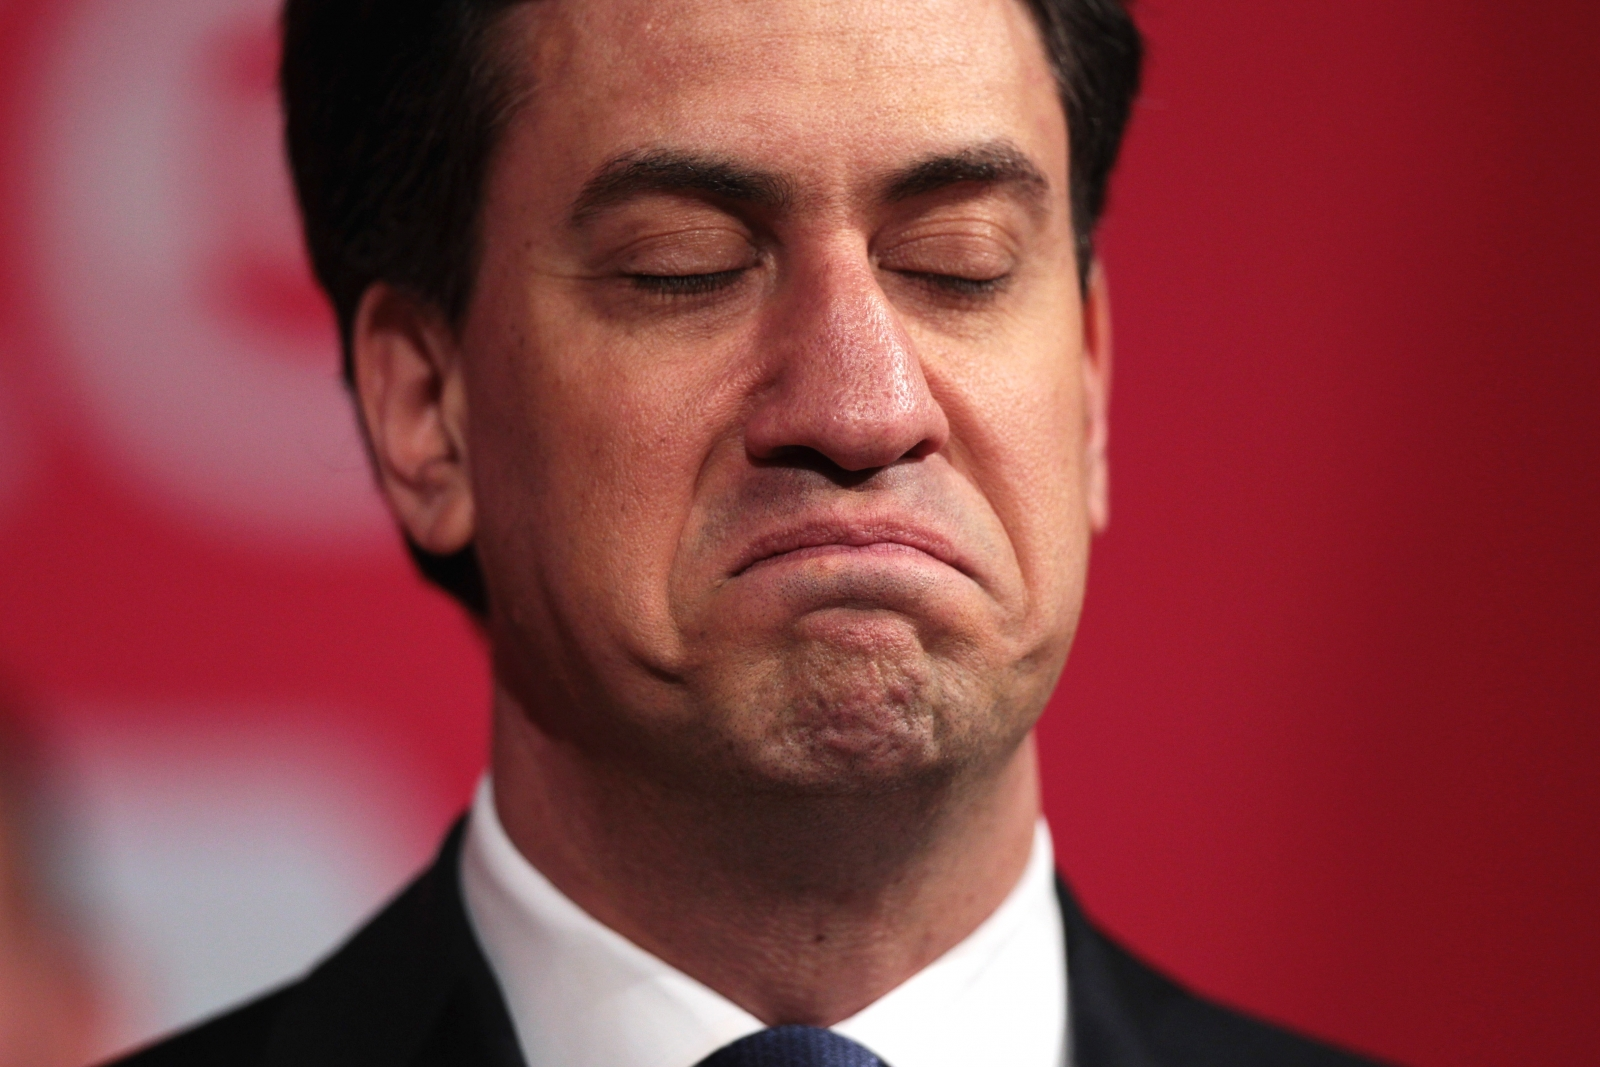 Ed Miliband Labour